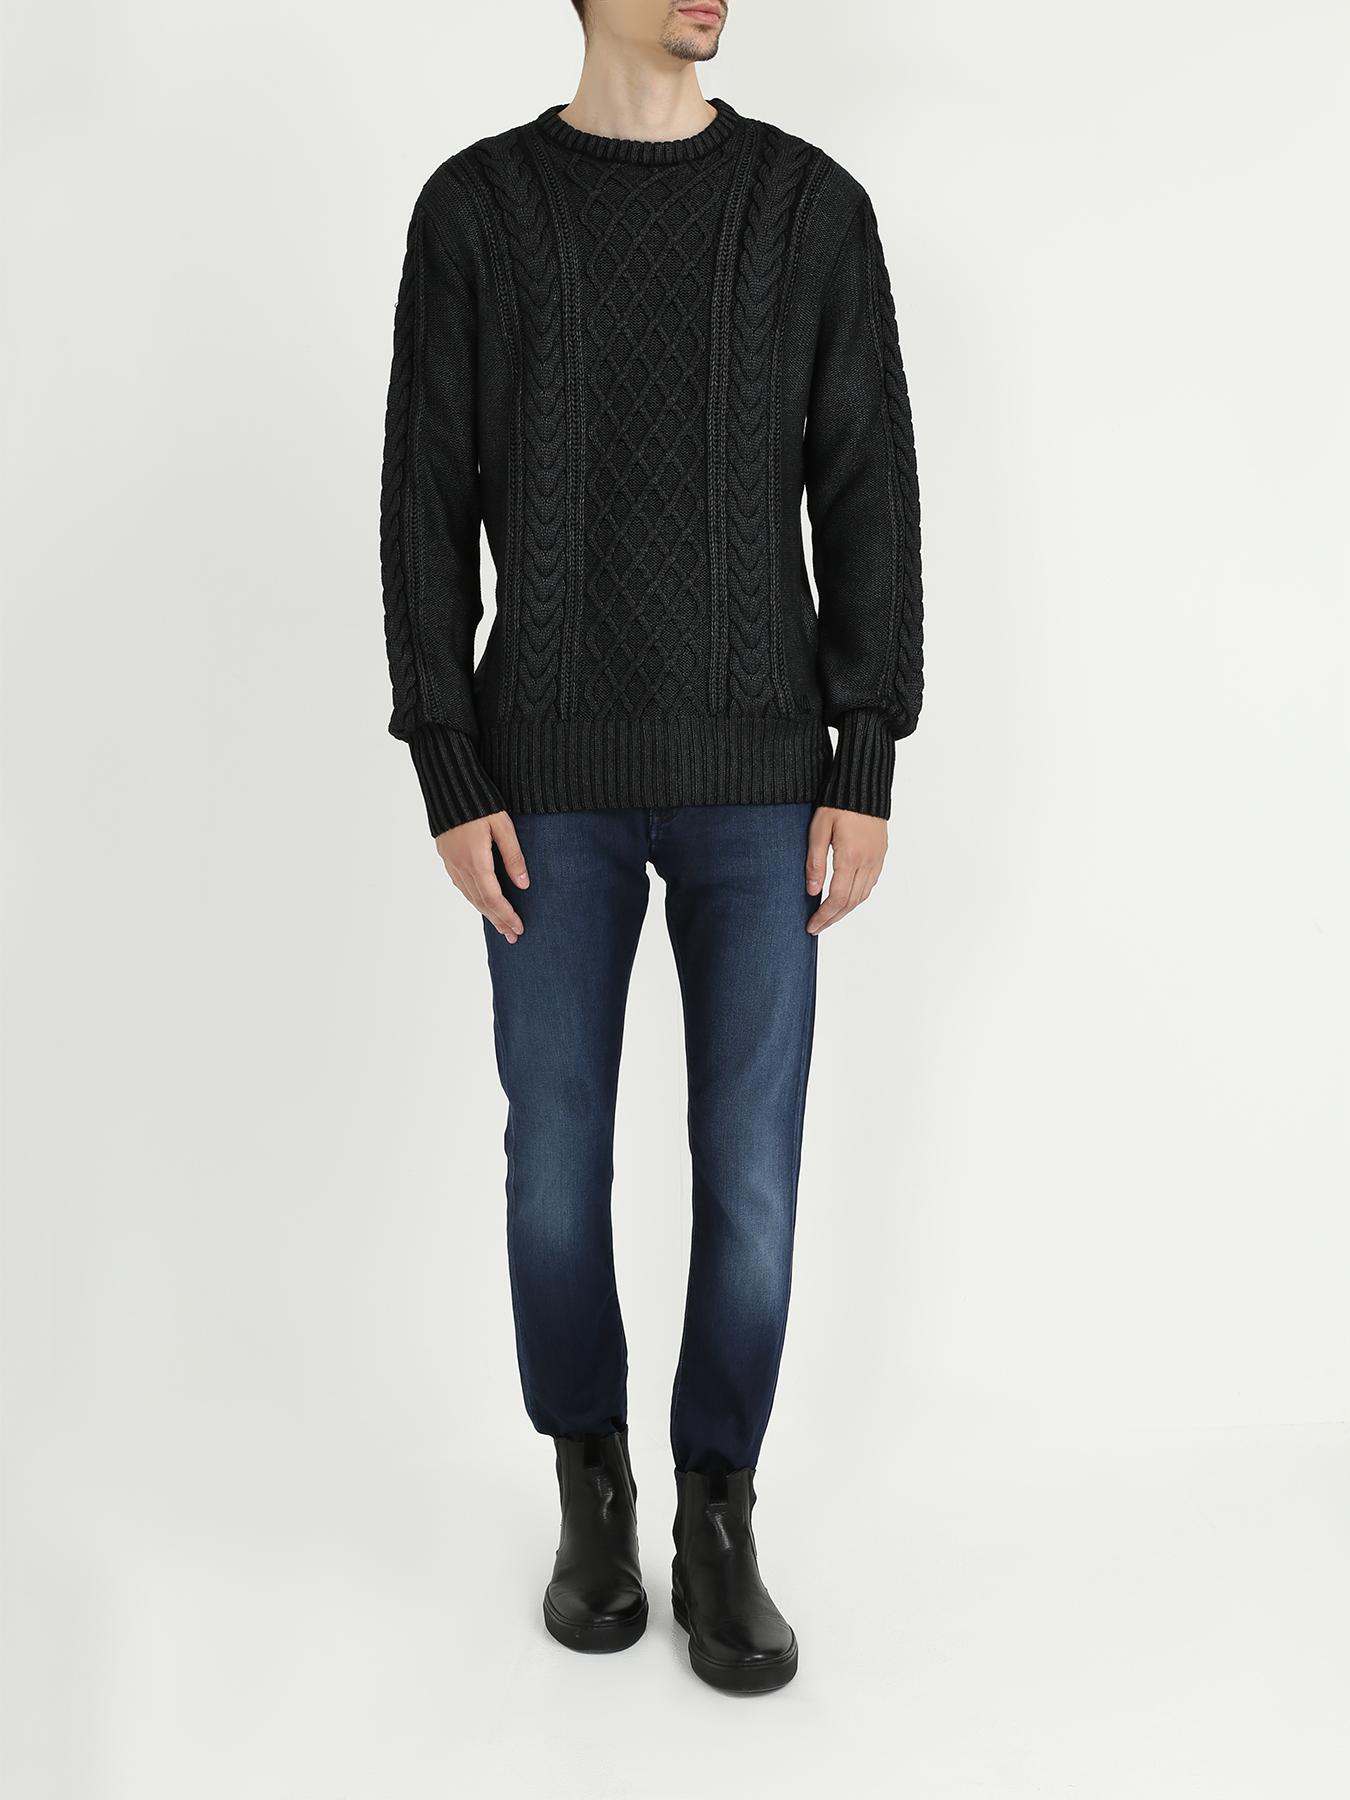 Джемпер Versace Jeans Джемпер из шерсти и акрила